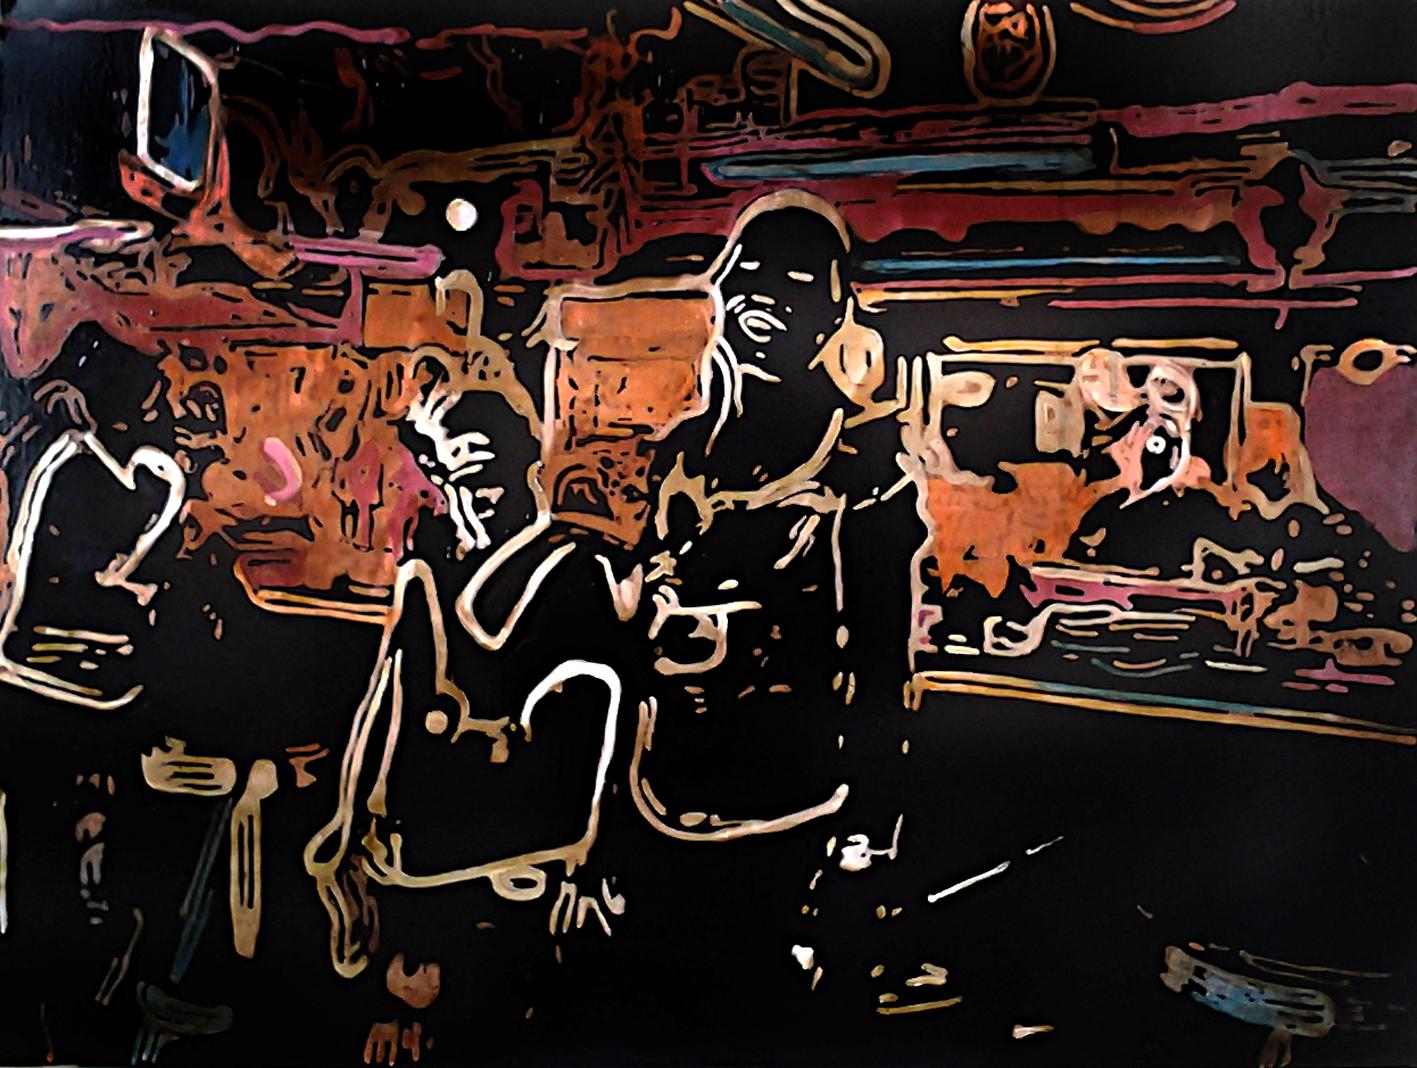 The Pub, 2015 | Mixed media on canvas | 100 x 76 cm | £1,500